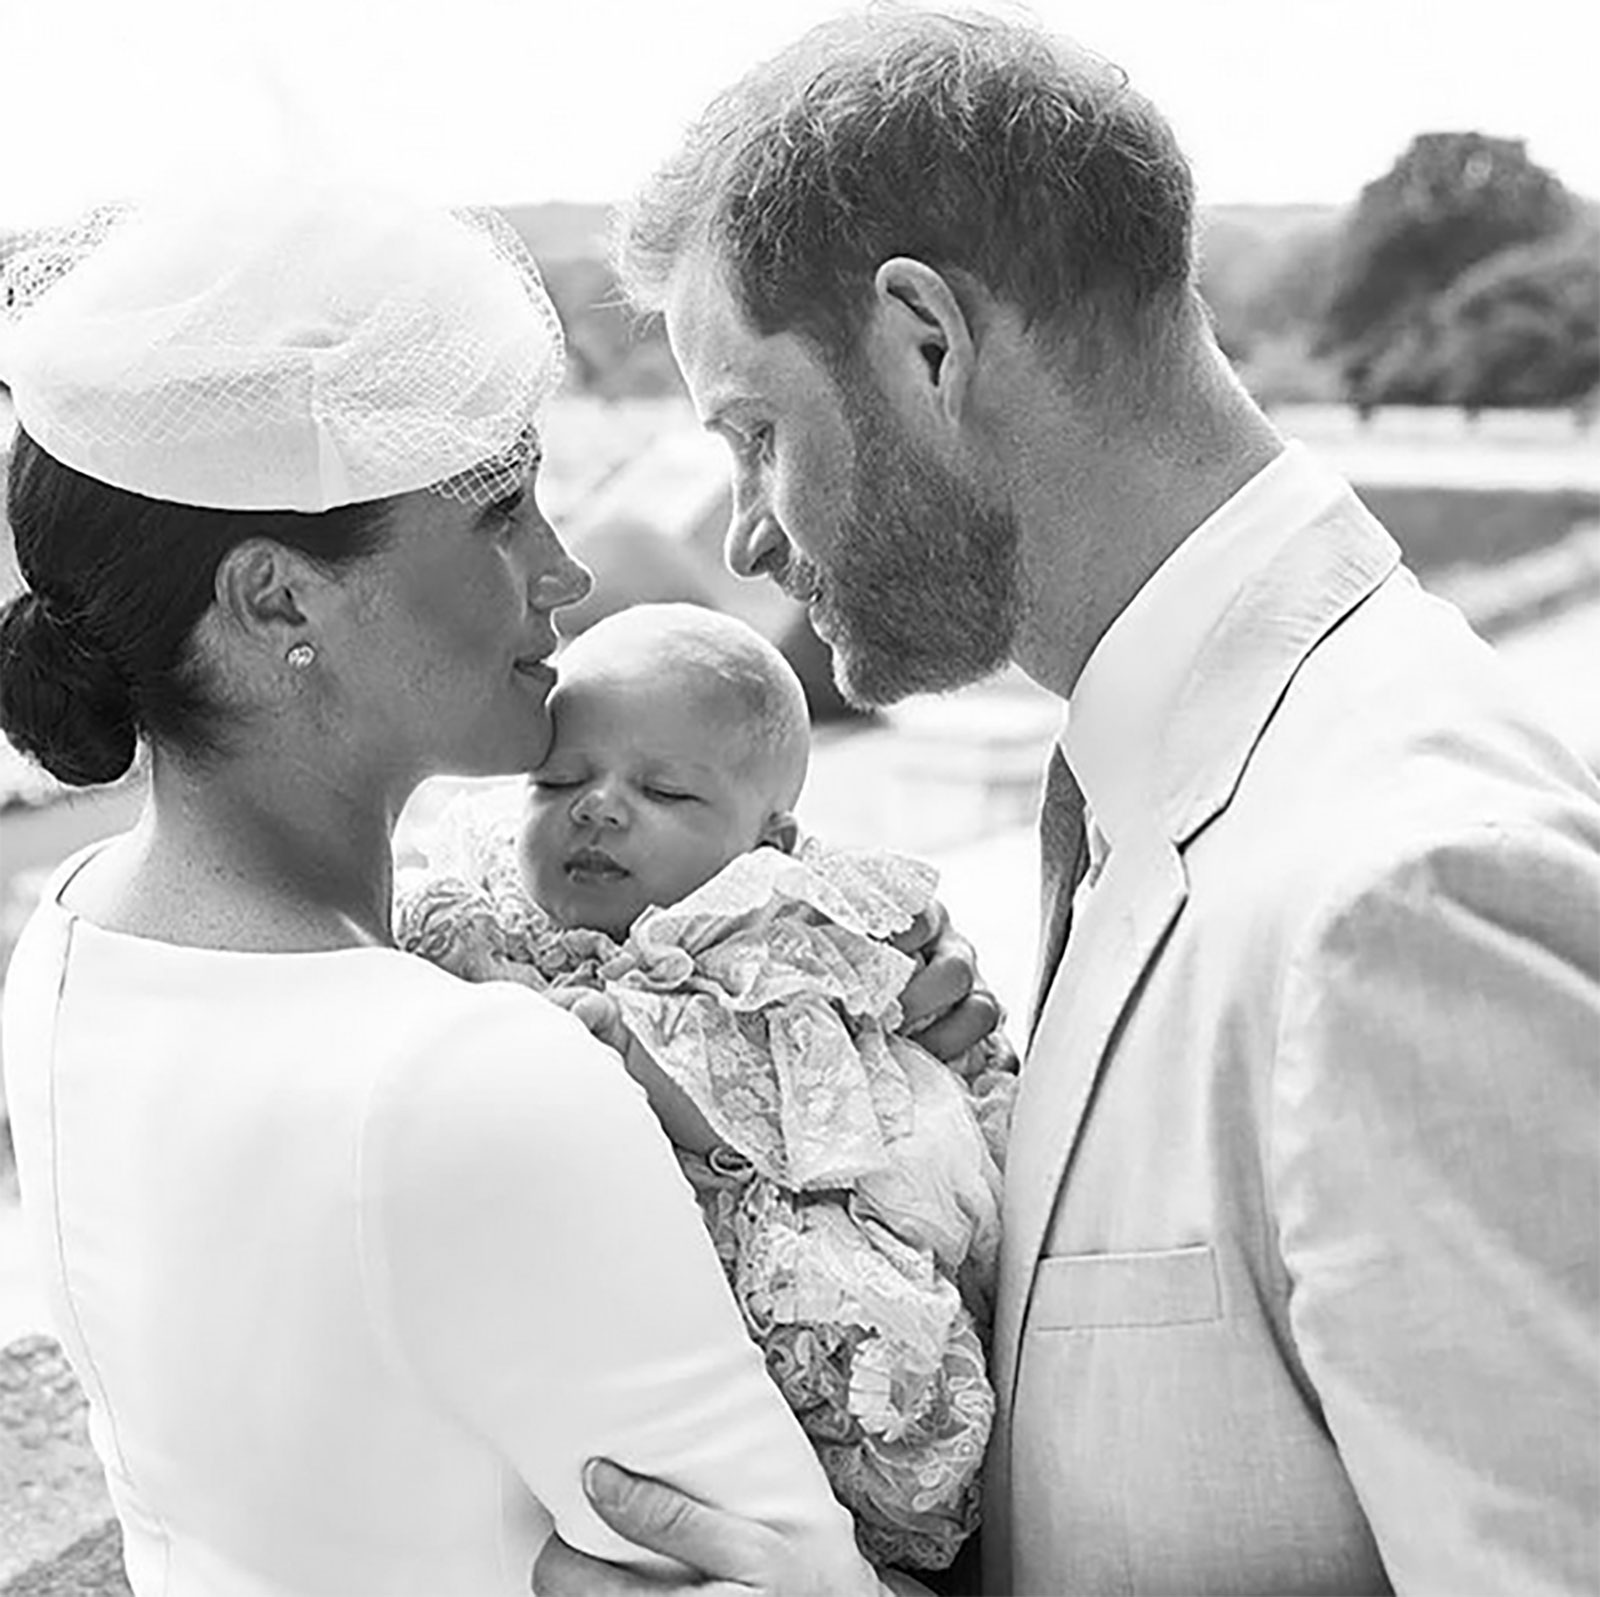 Bautizo de Archie, Meghan Markle, príncipe Harry